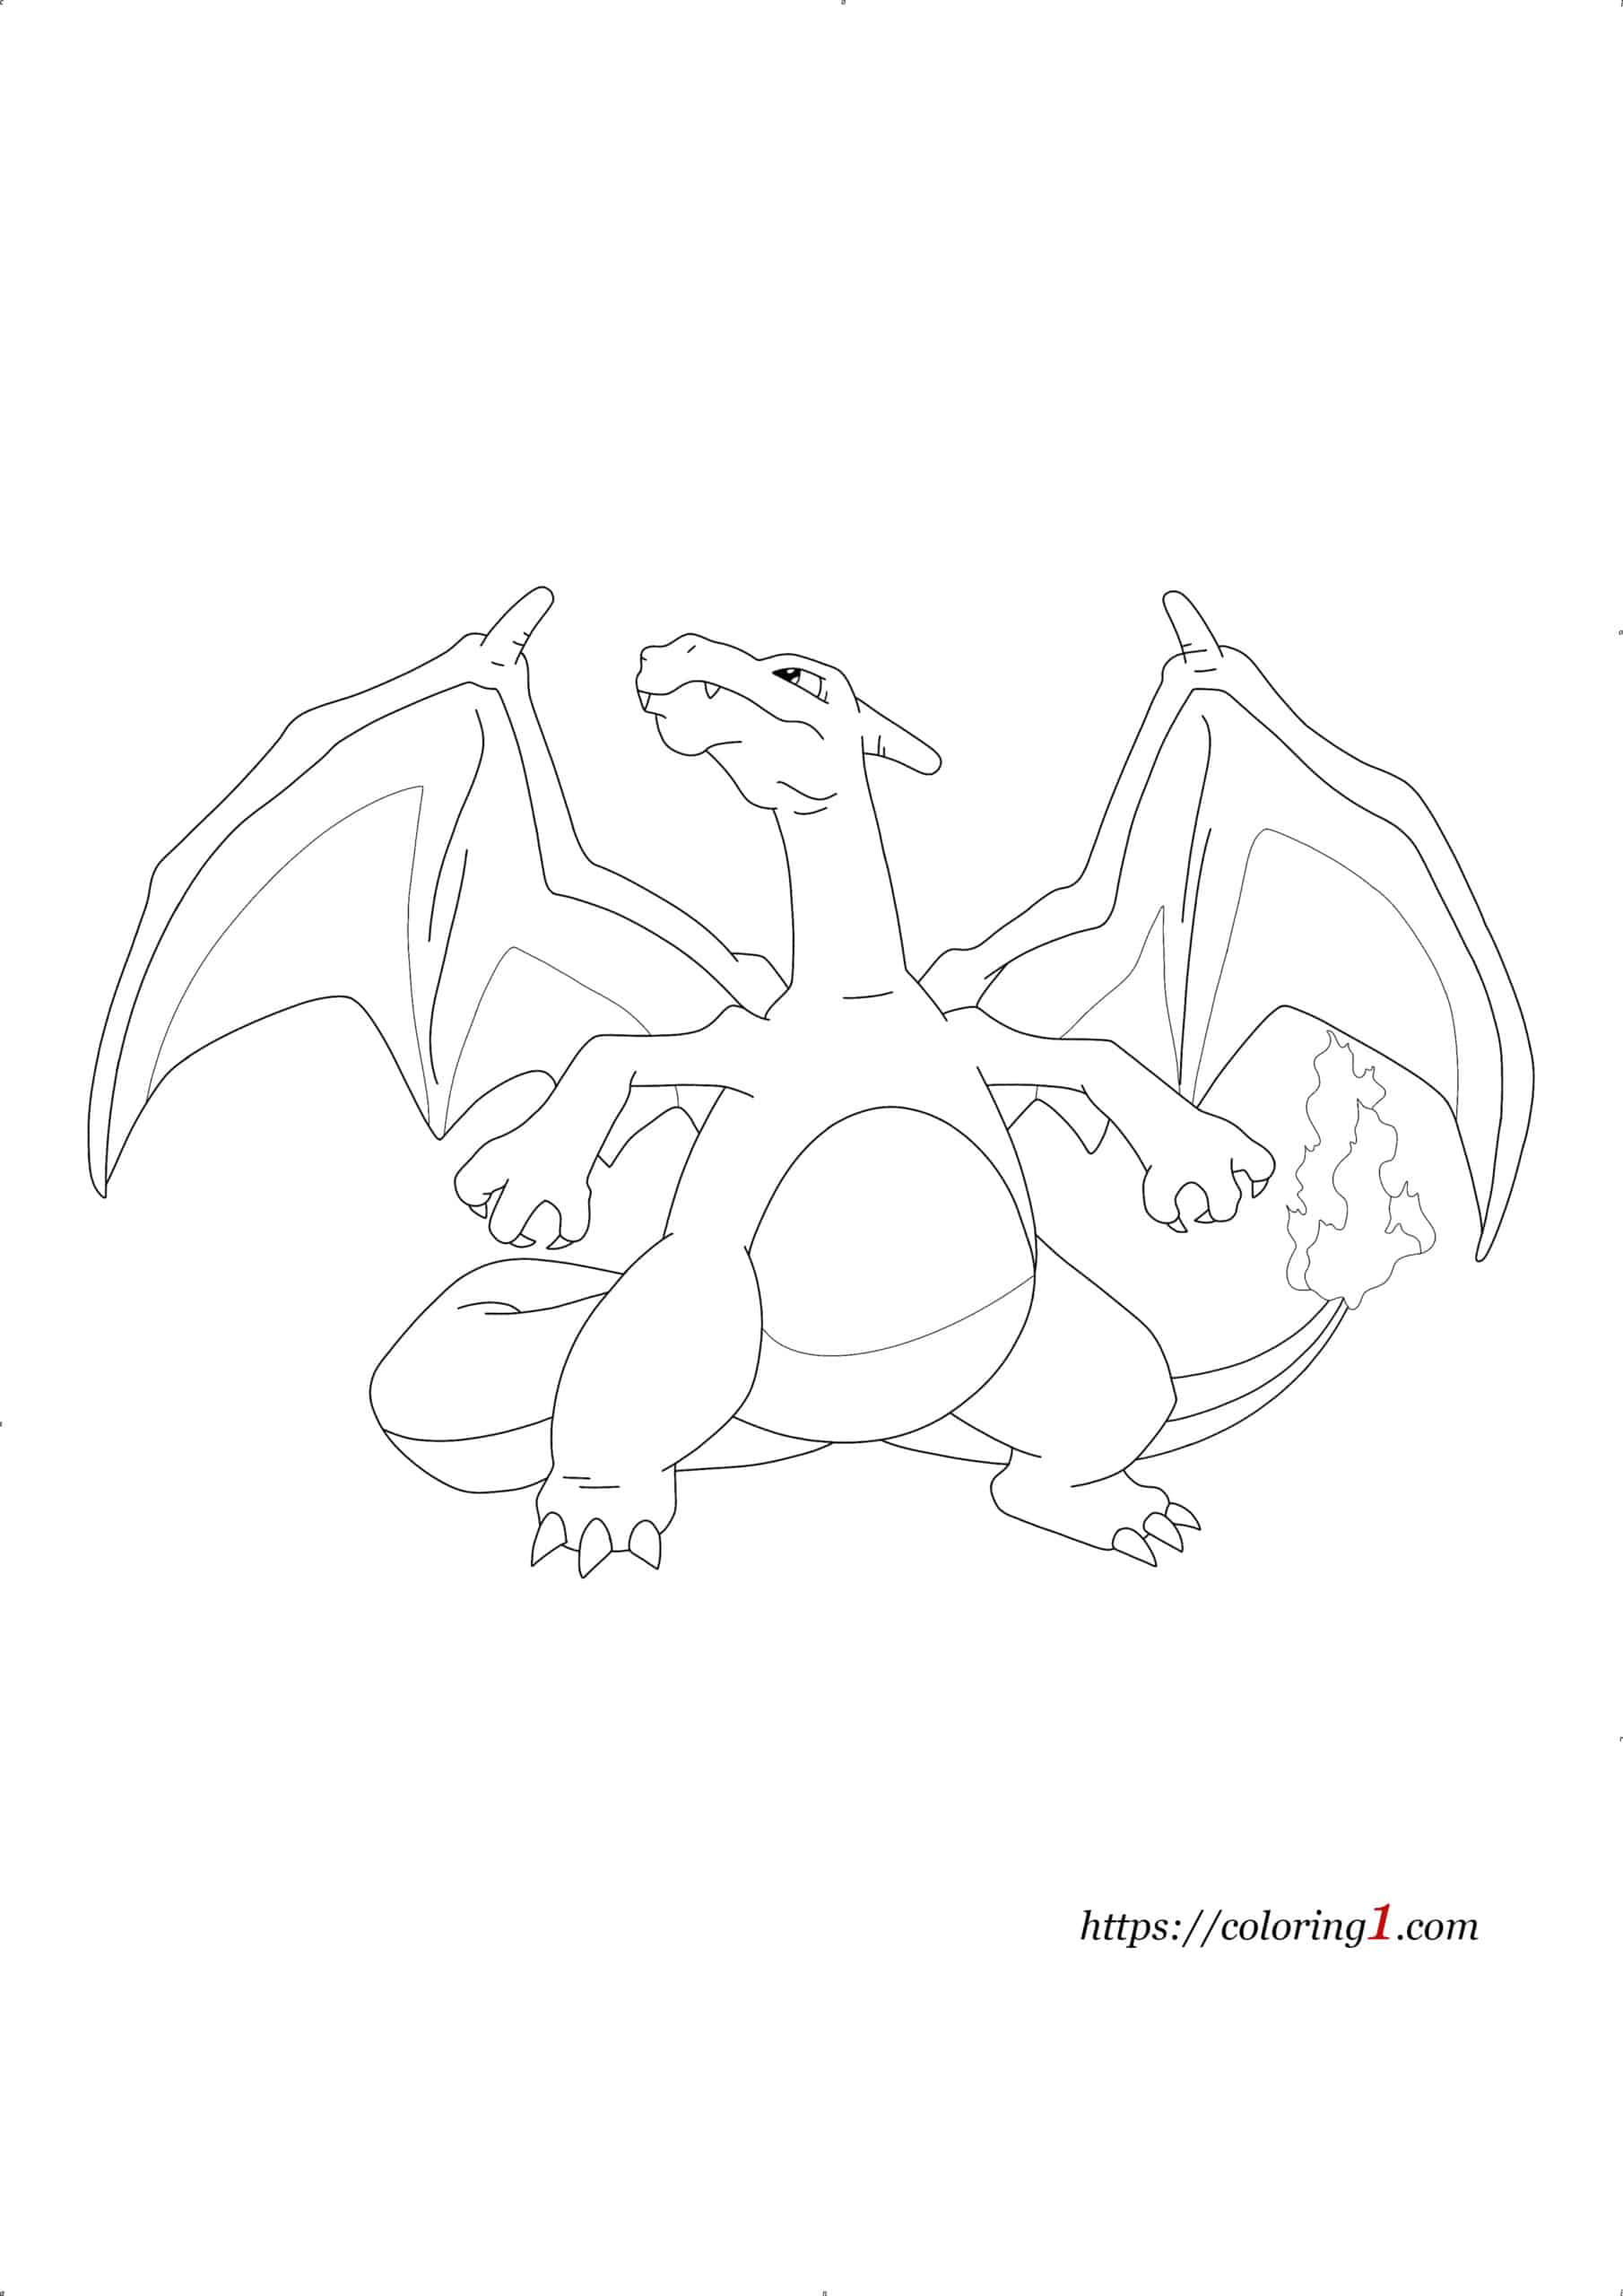 Pokemon Charizard coloring page